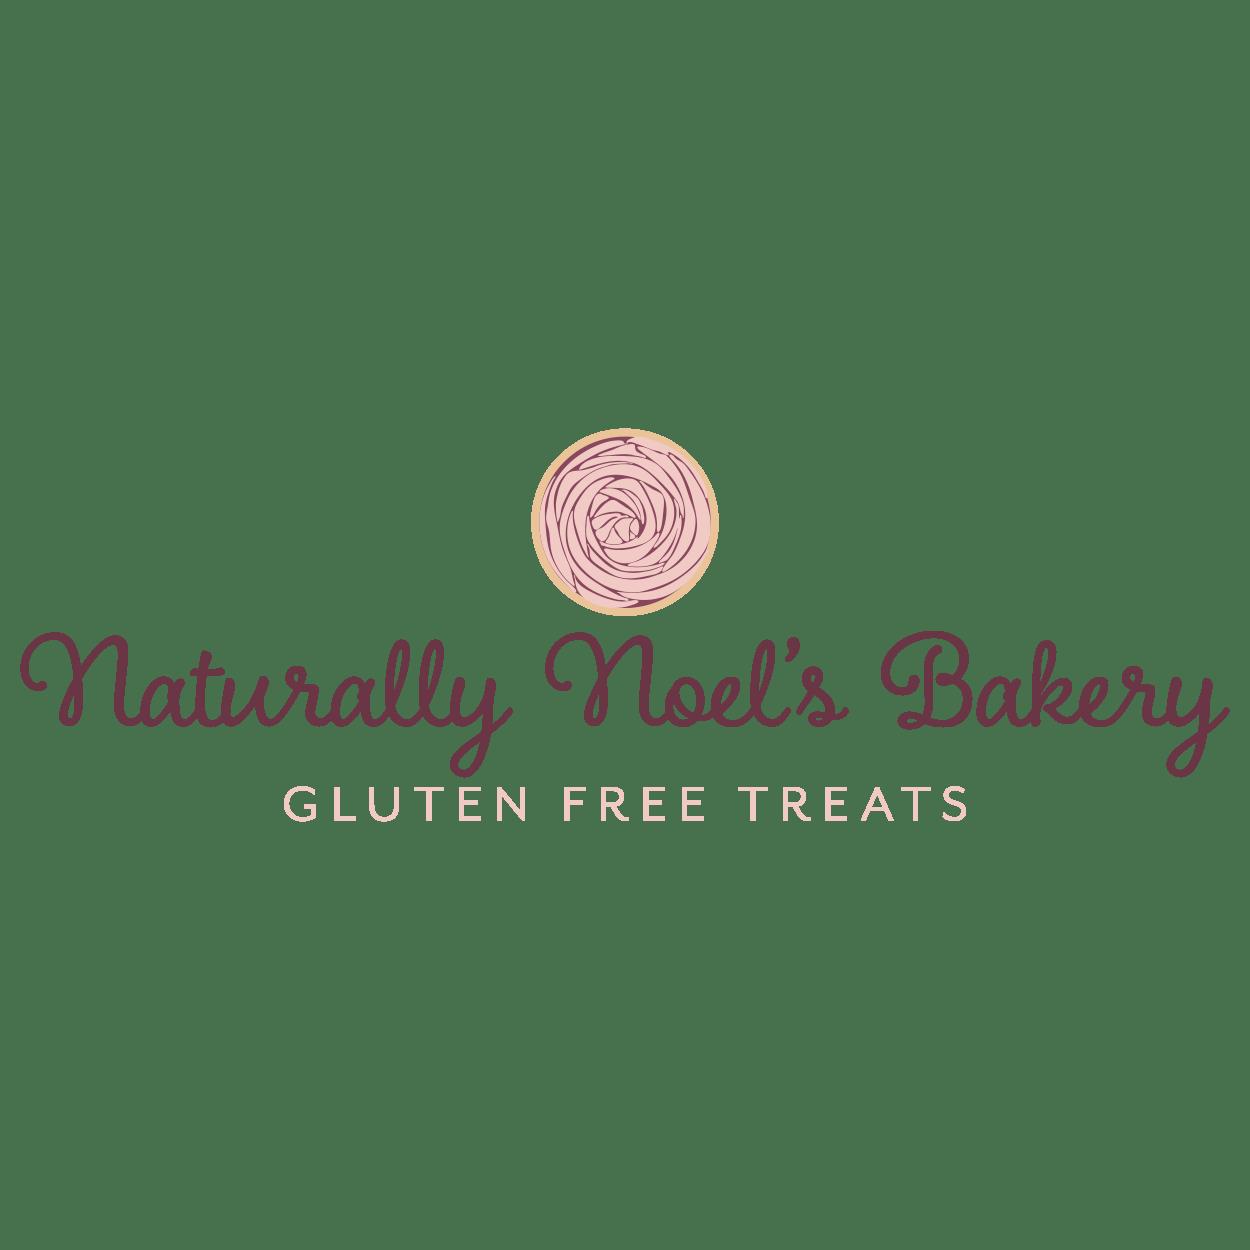 Naturally Noels Bakery Logo - Designed by CraftnDraft Inc